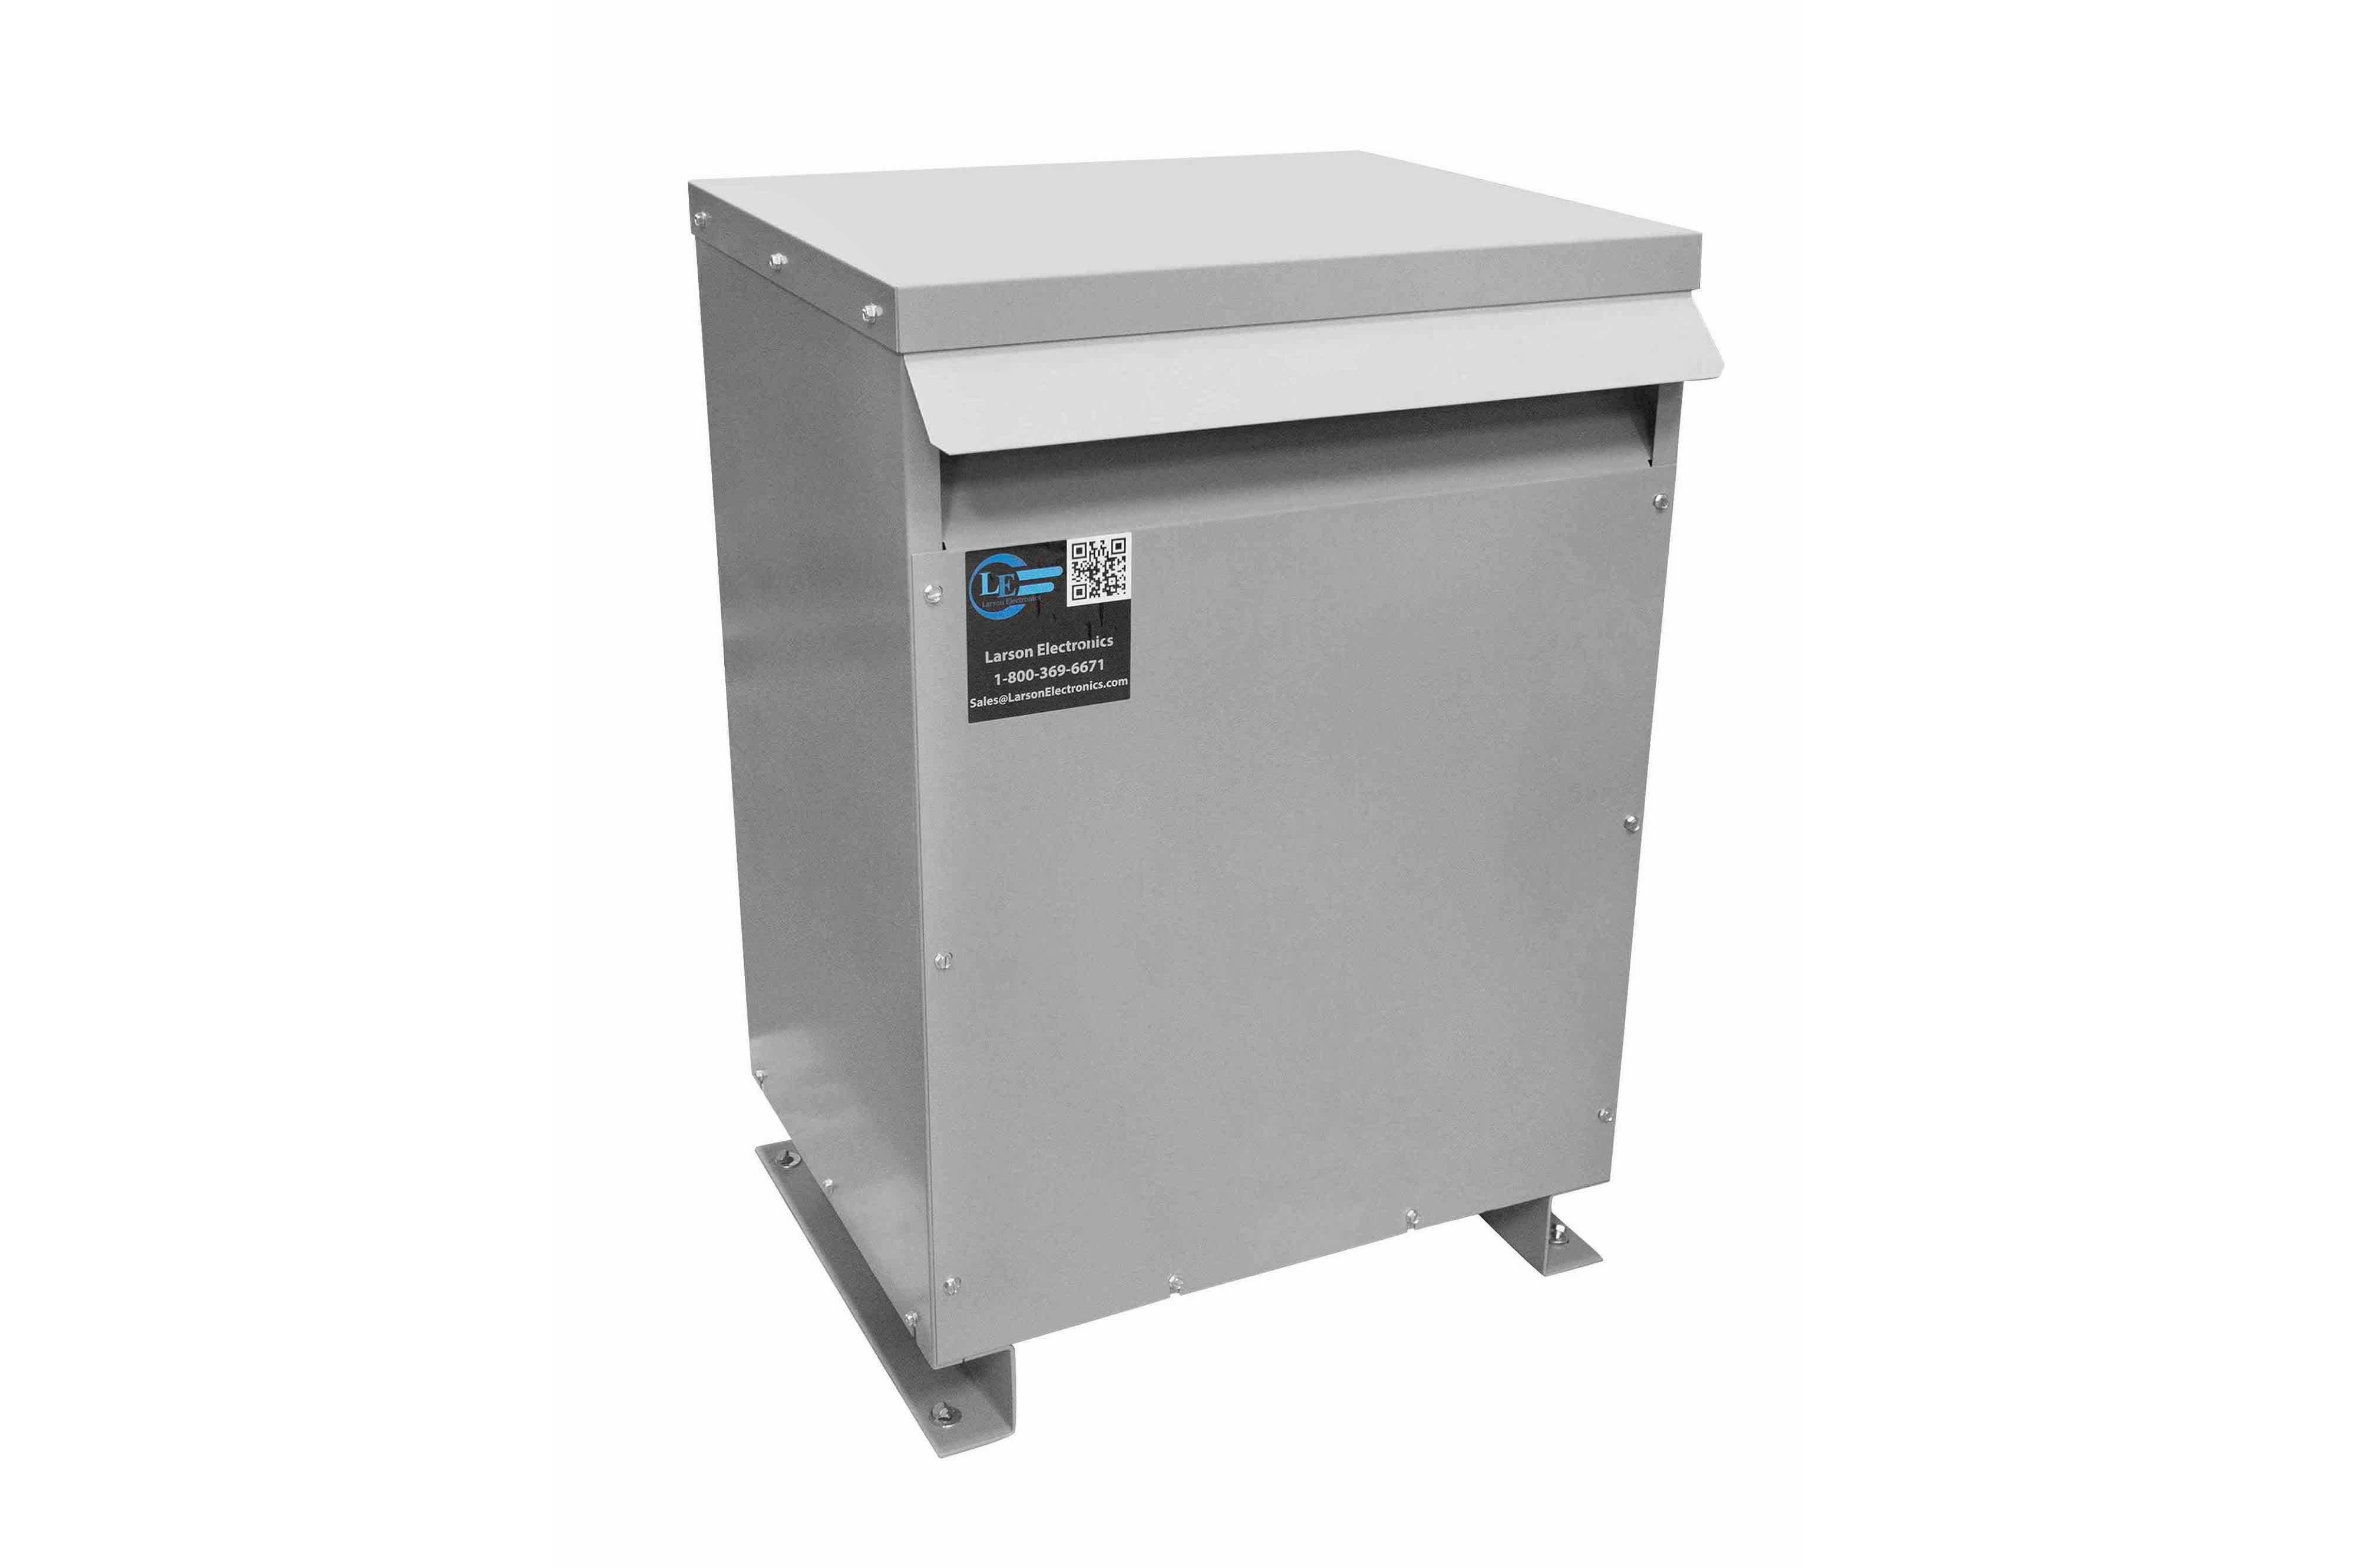 15 kVA 3PH Isolation Transformer, 415V Wye Primary, 240V/120 Delta Secondary, N3R, Ventilated, 60 Hz